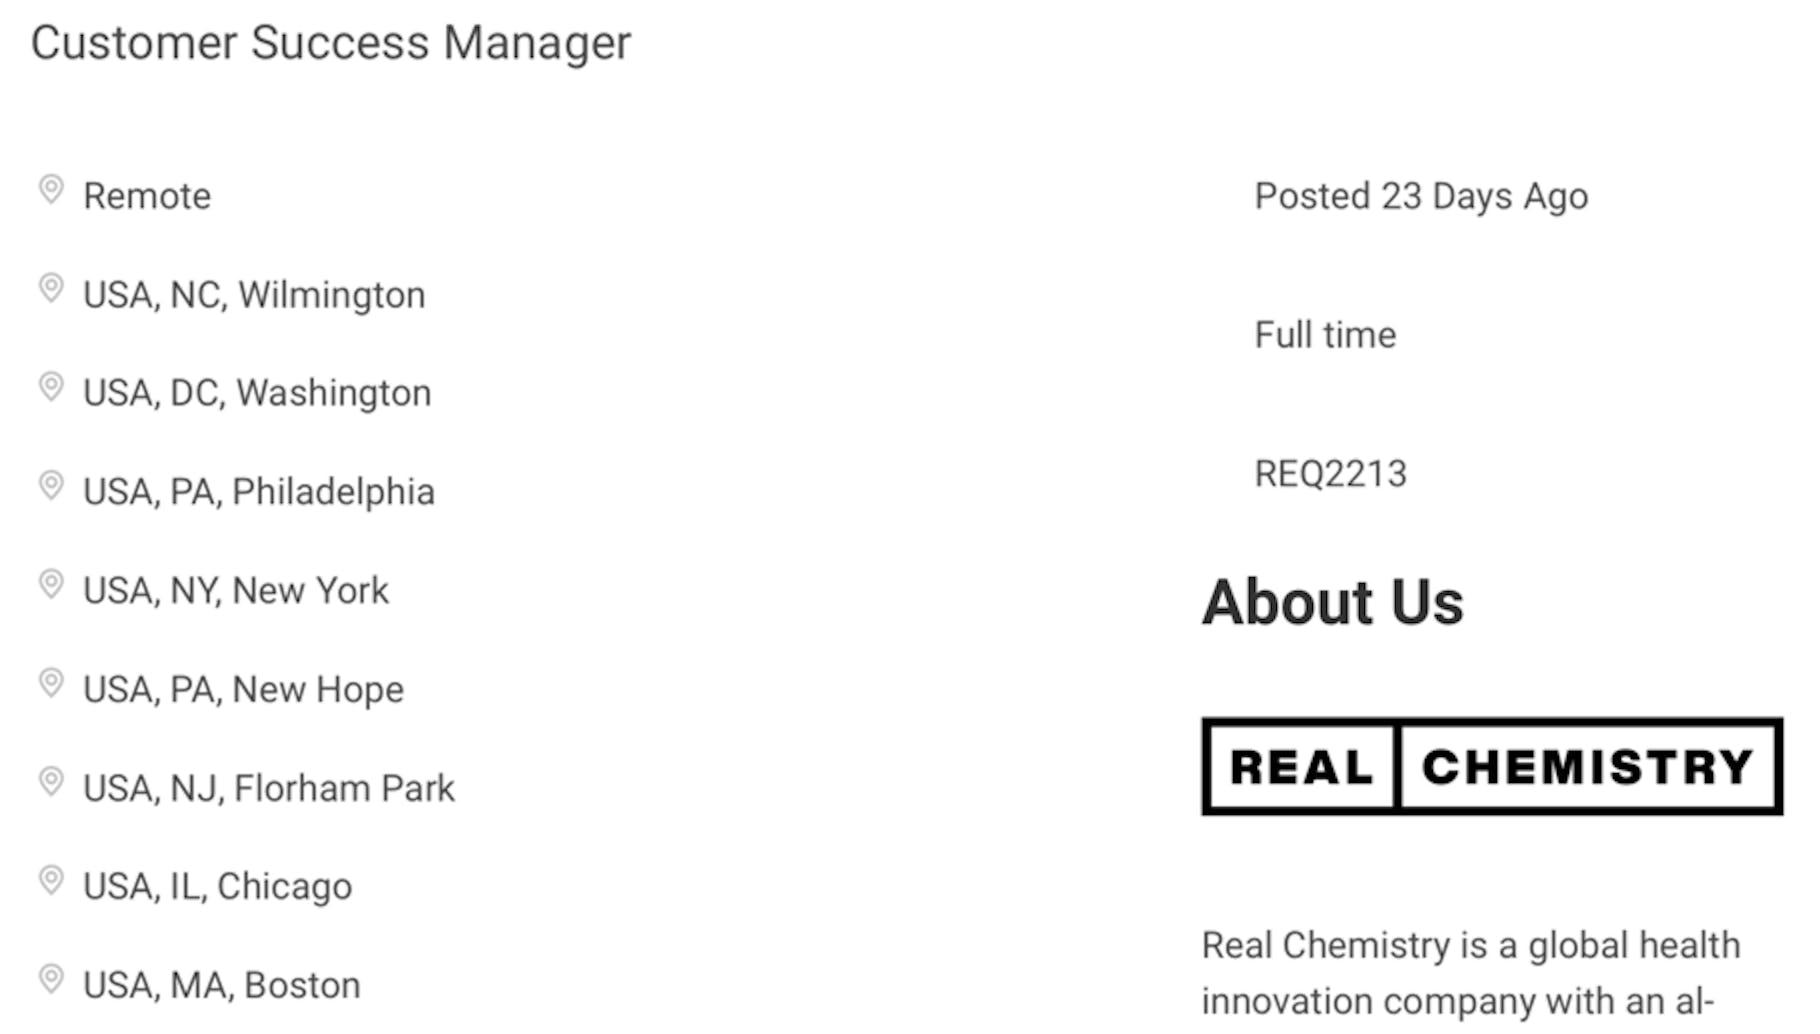 real chemistry customer success specialist job description